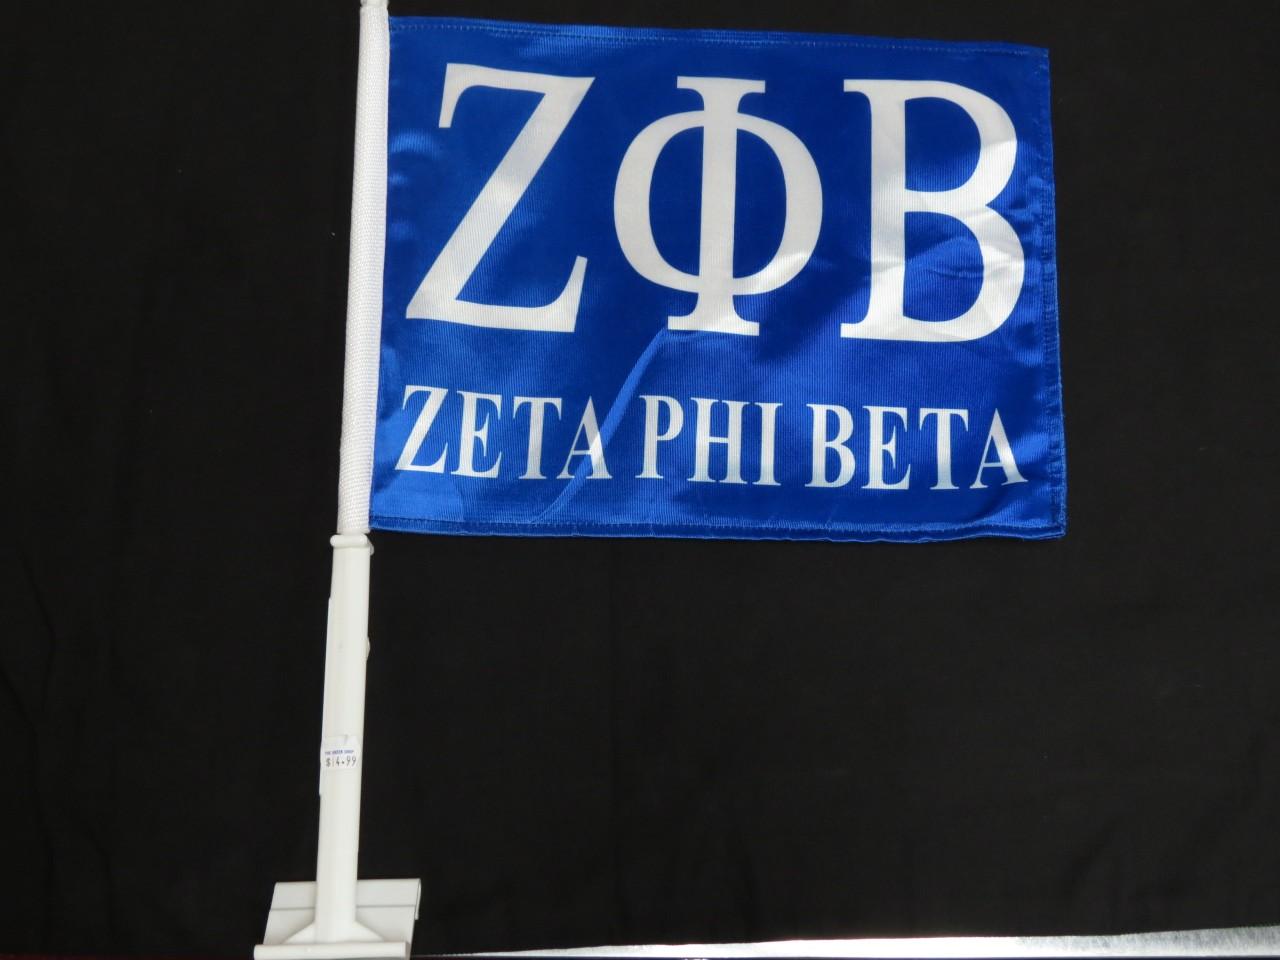 Zeta Phi Beta Car Flags - The Greek Shop